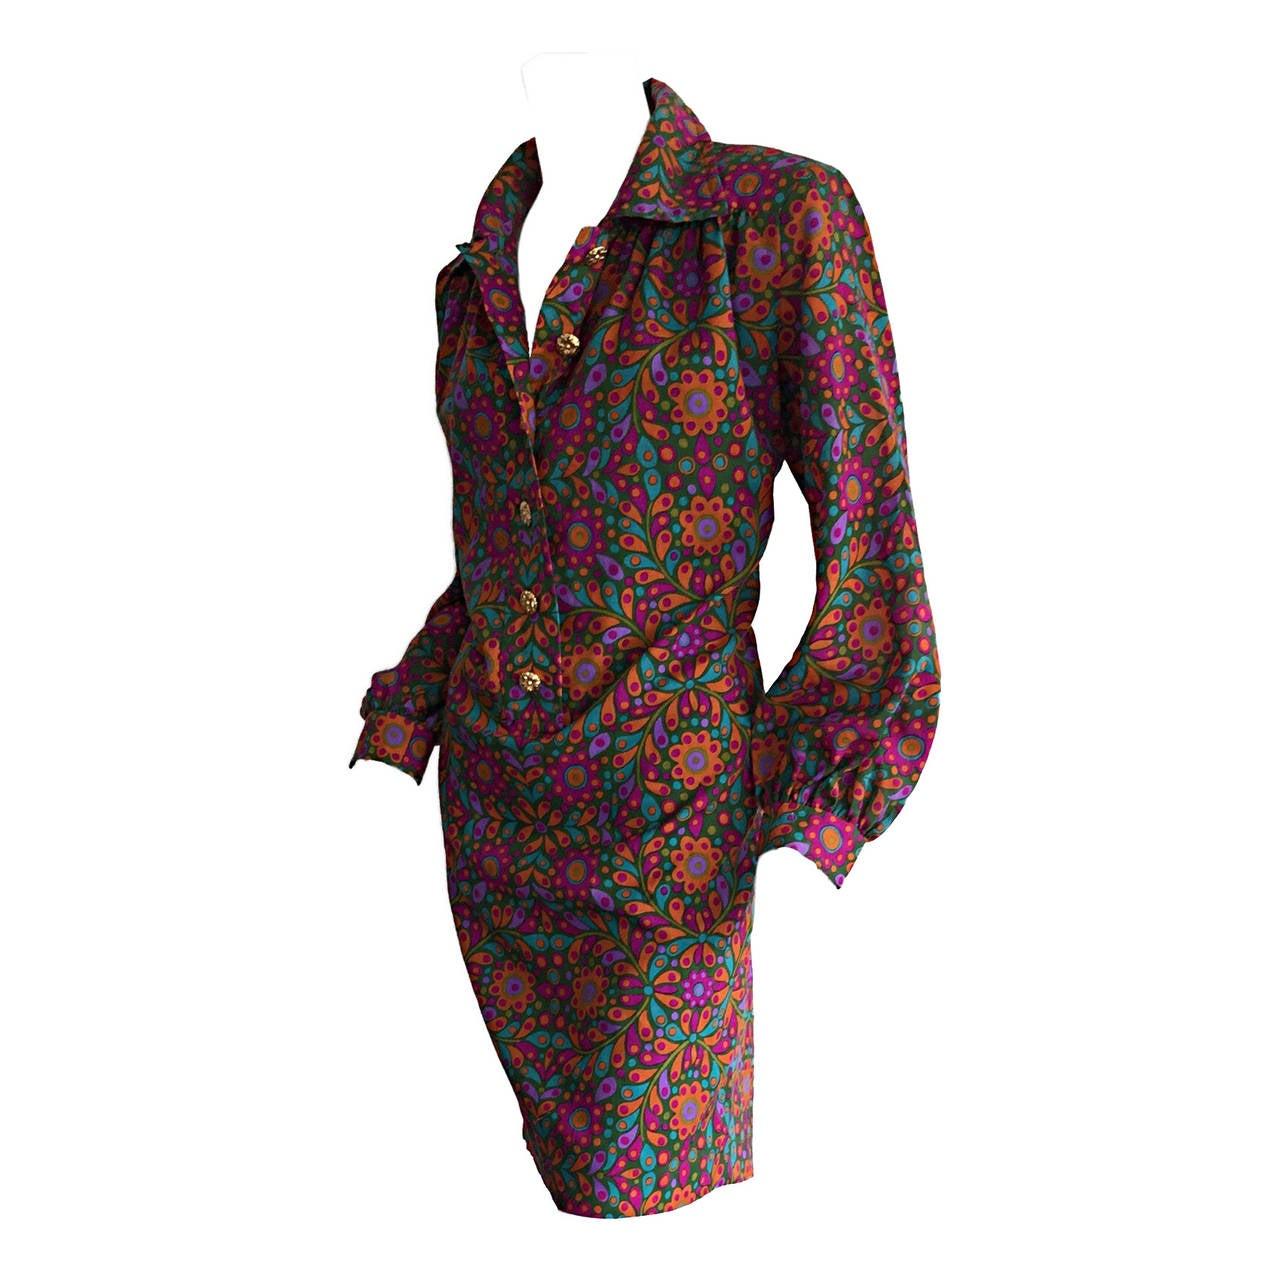 Splendid Vintage Yves Saint Laurent ' Rive Gauche ' Colorful Flower Dress